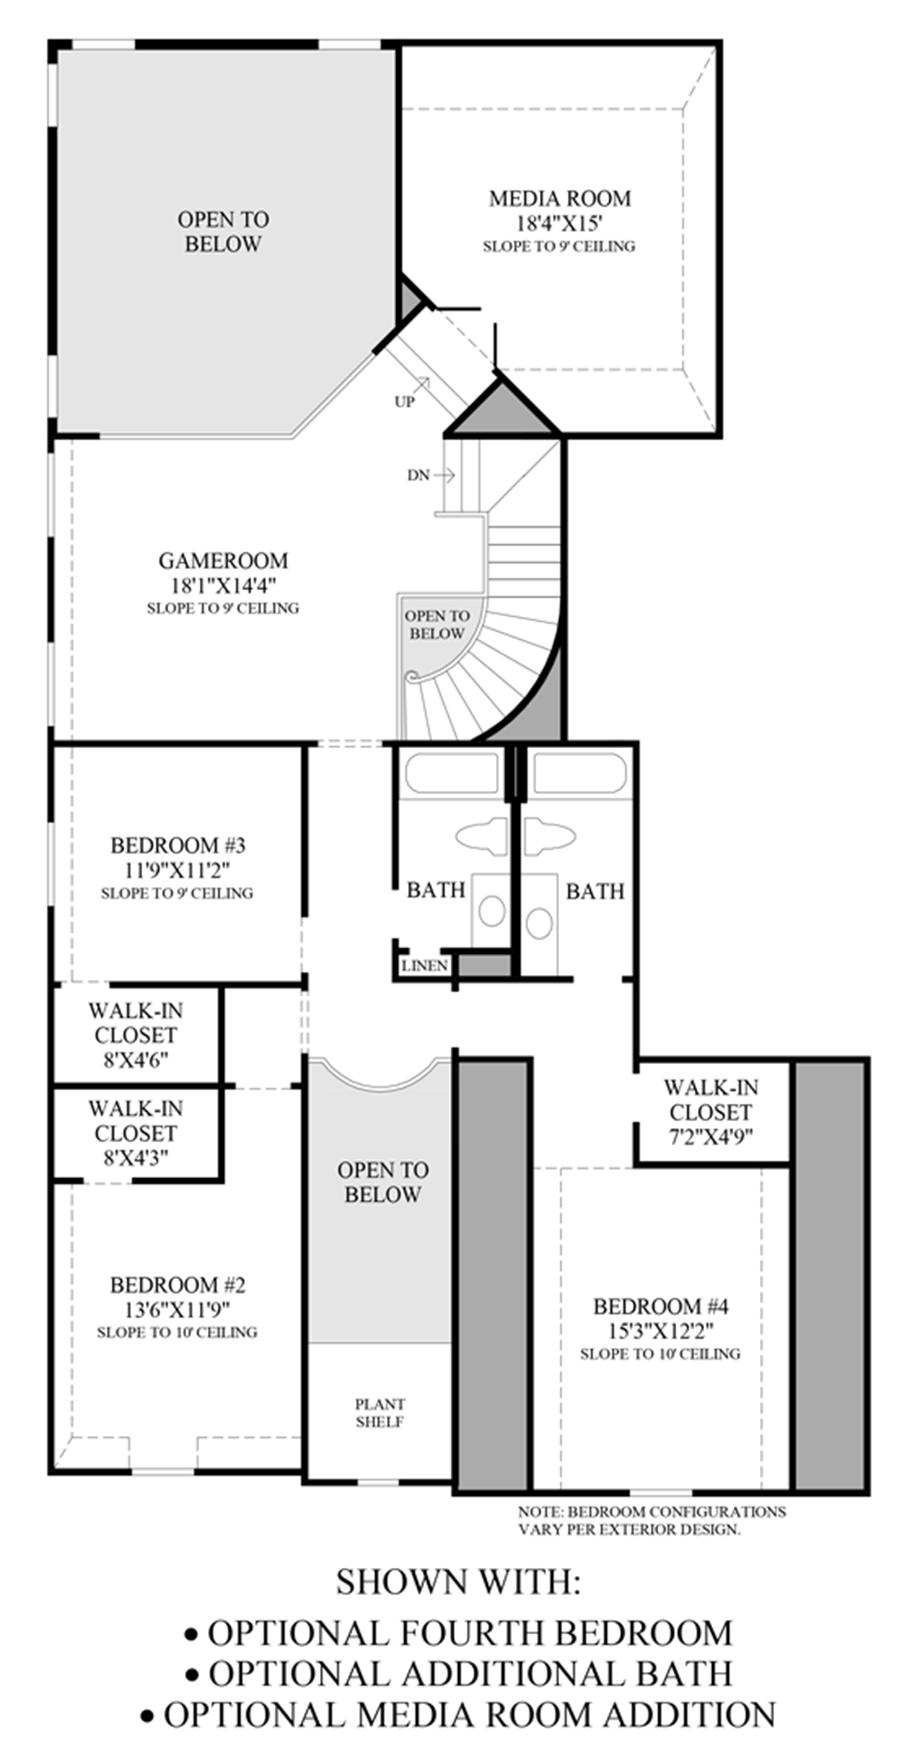 Optional 4th Bedroom/Additional Bath/Media Room Addition Floor Plan